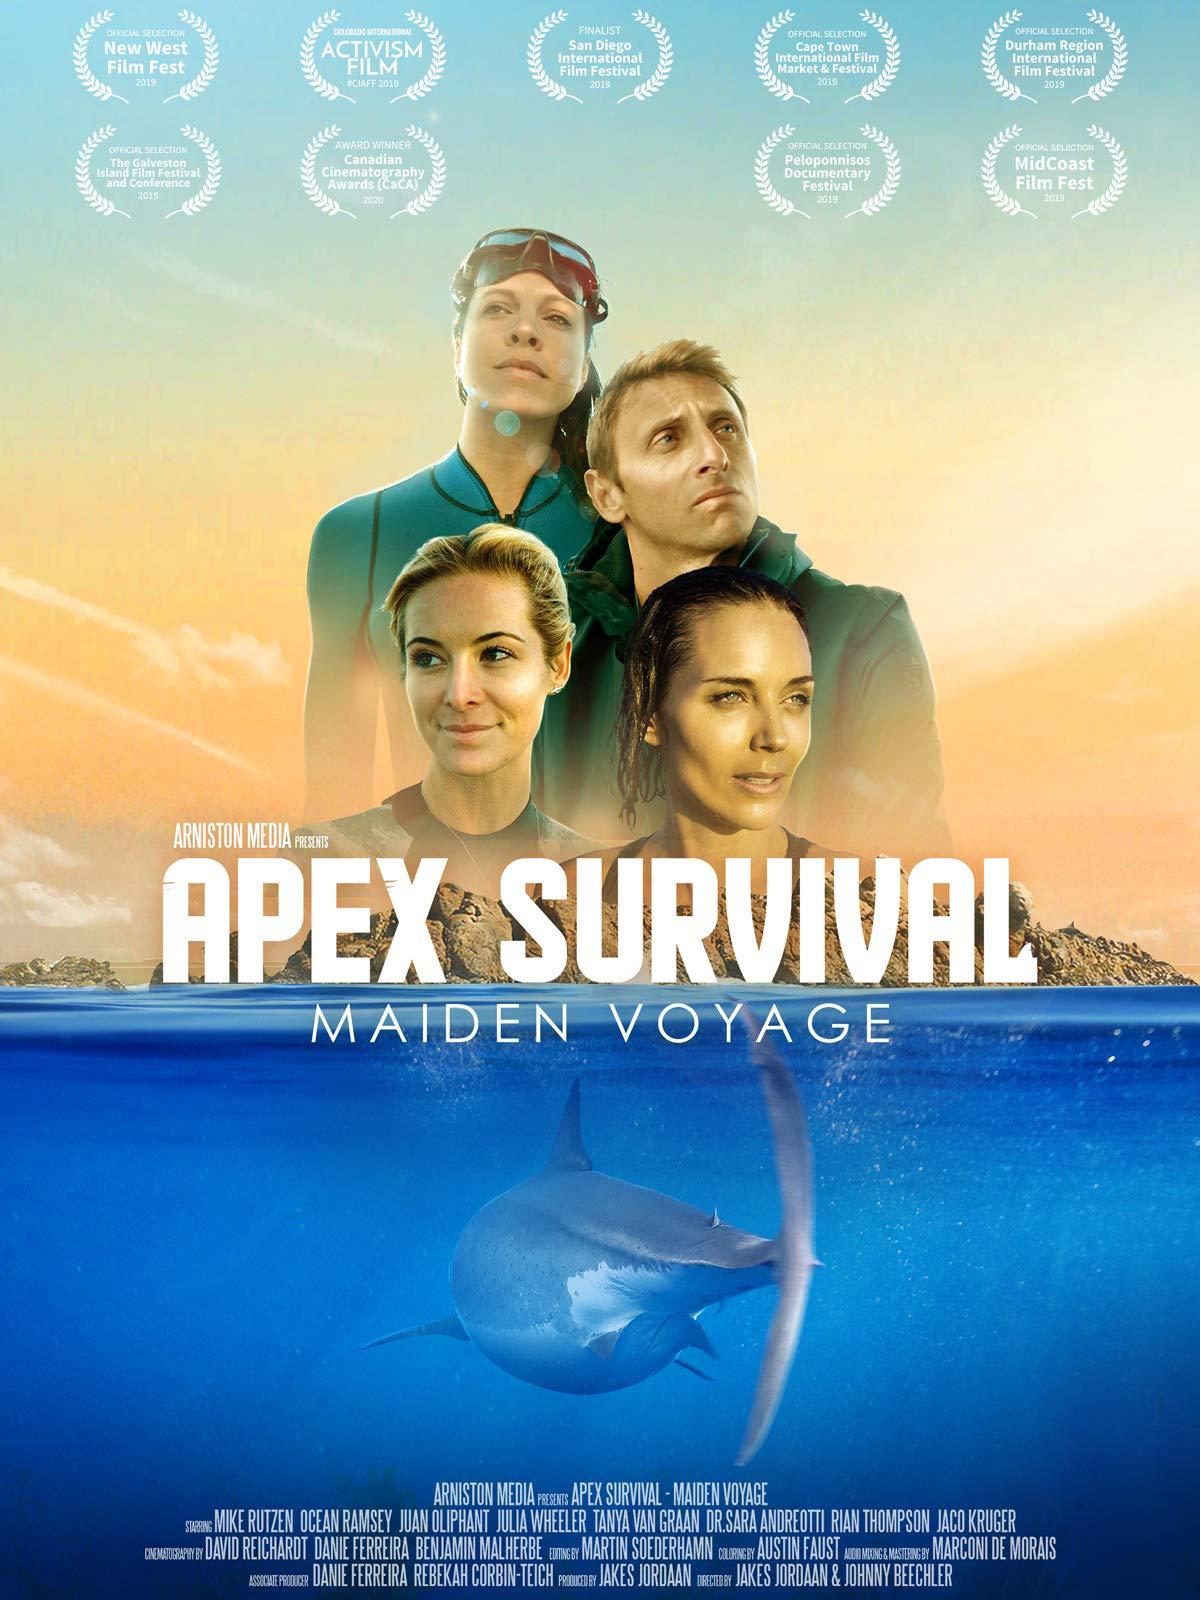 Apex Survival - Maiden Voyage